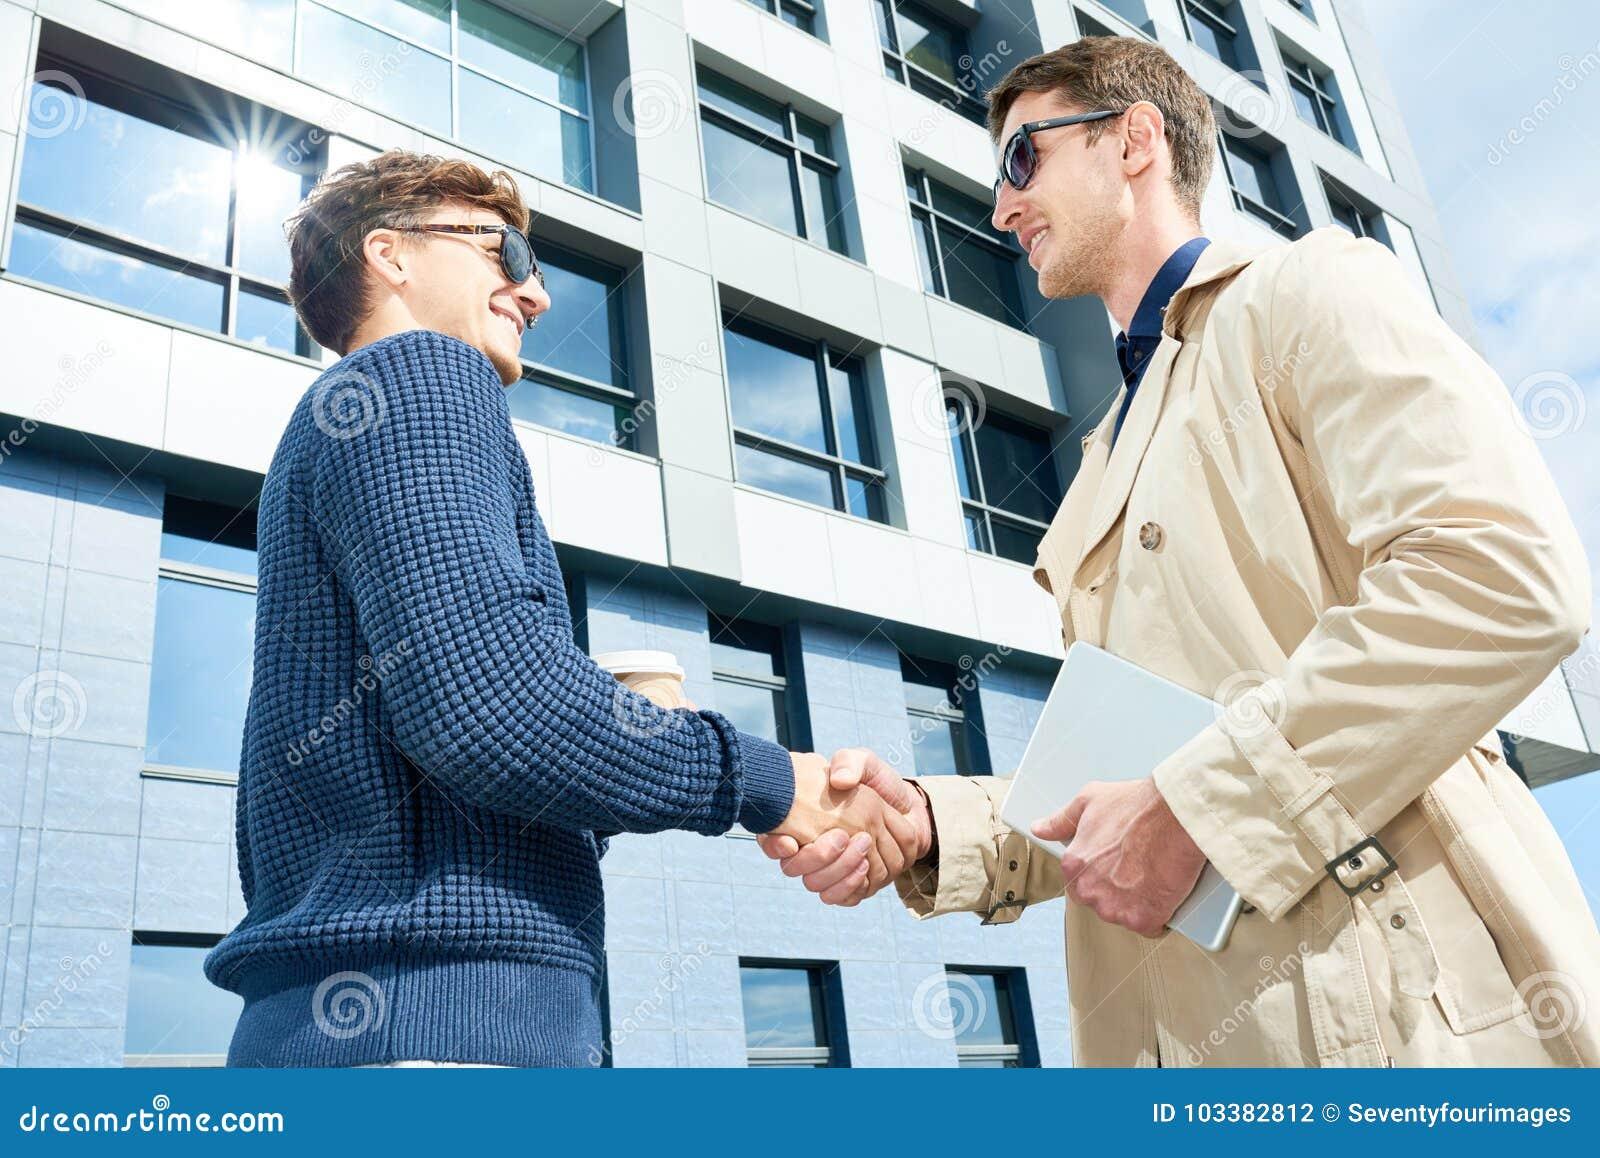 Reunión de dos empresarios al aire libre